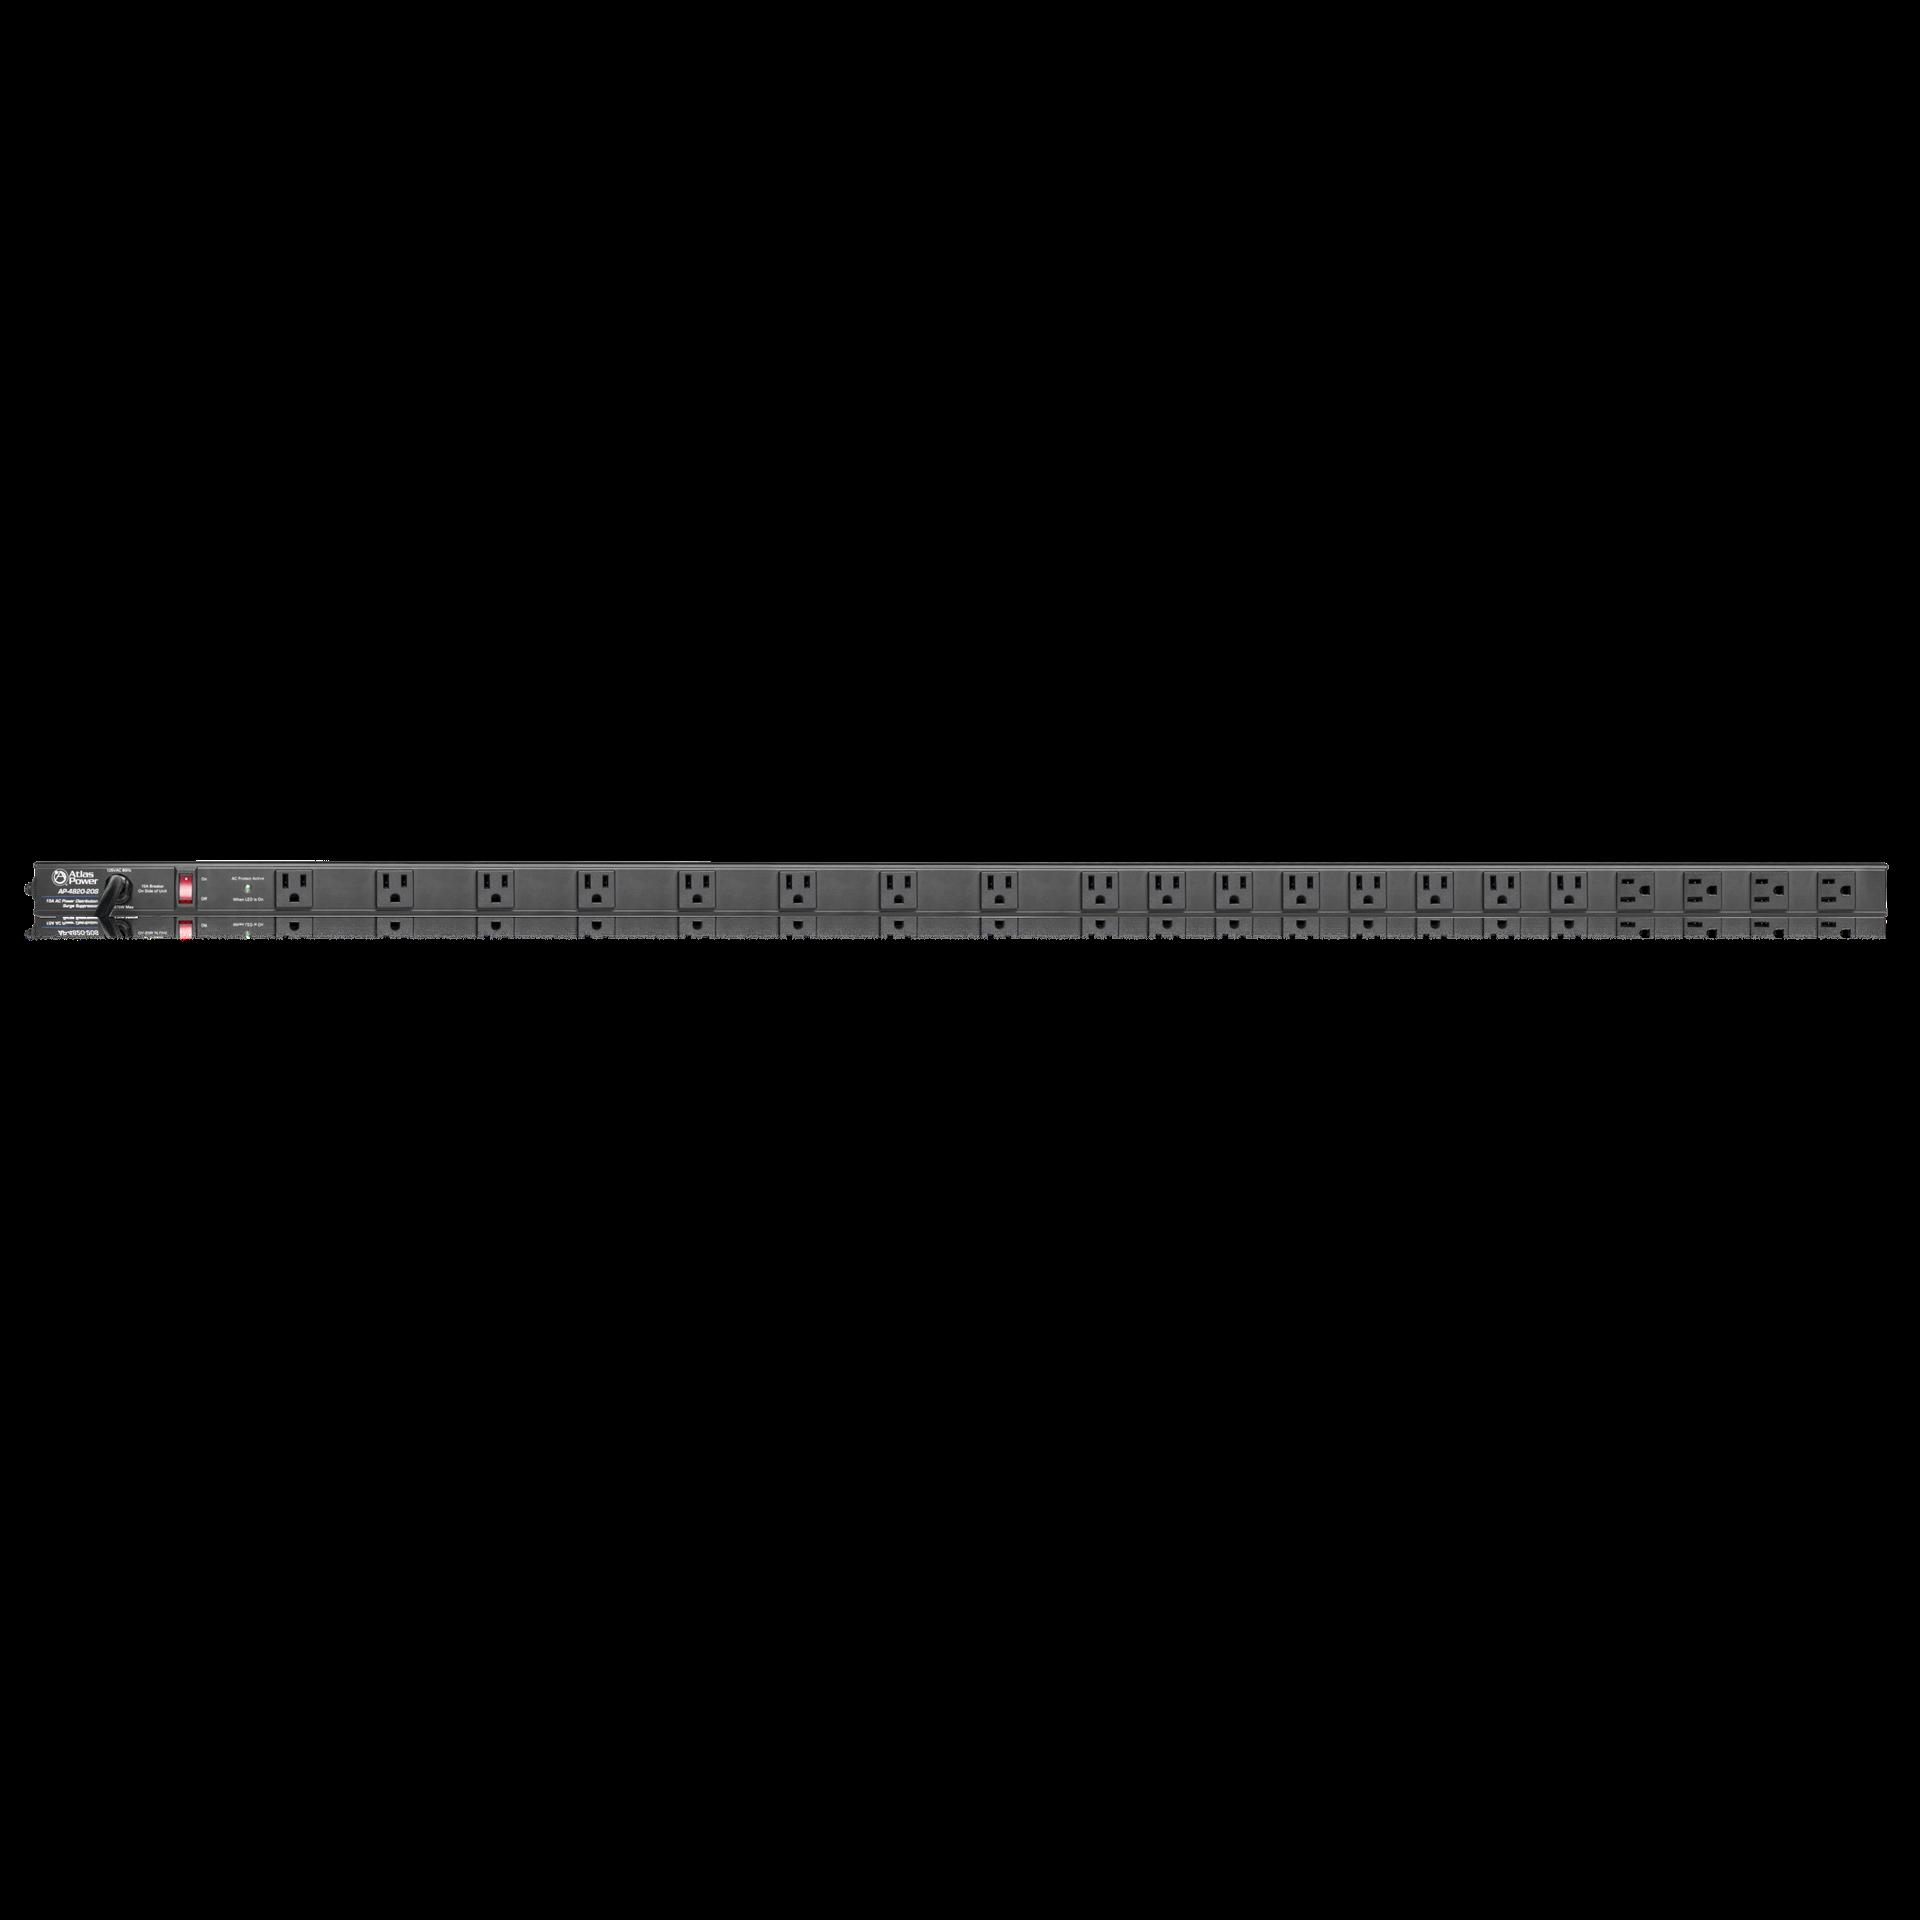 20 inch power strips